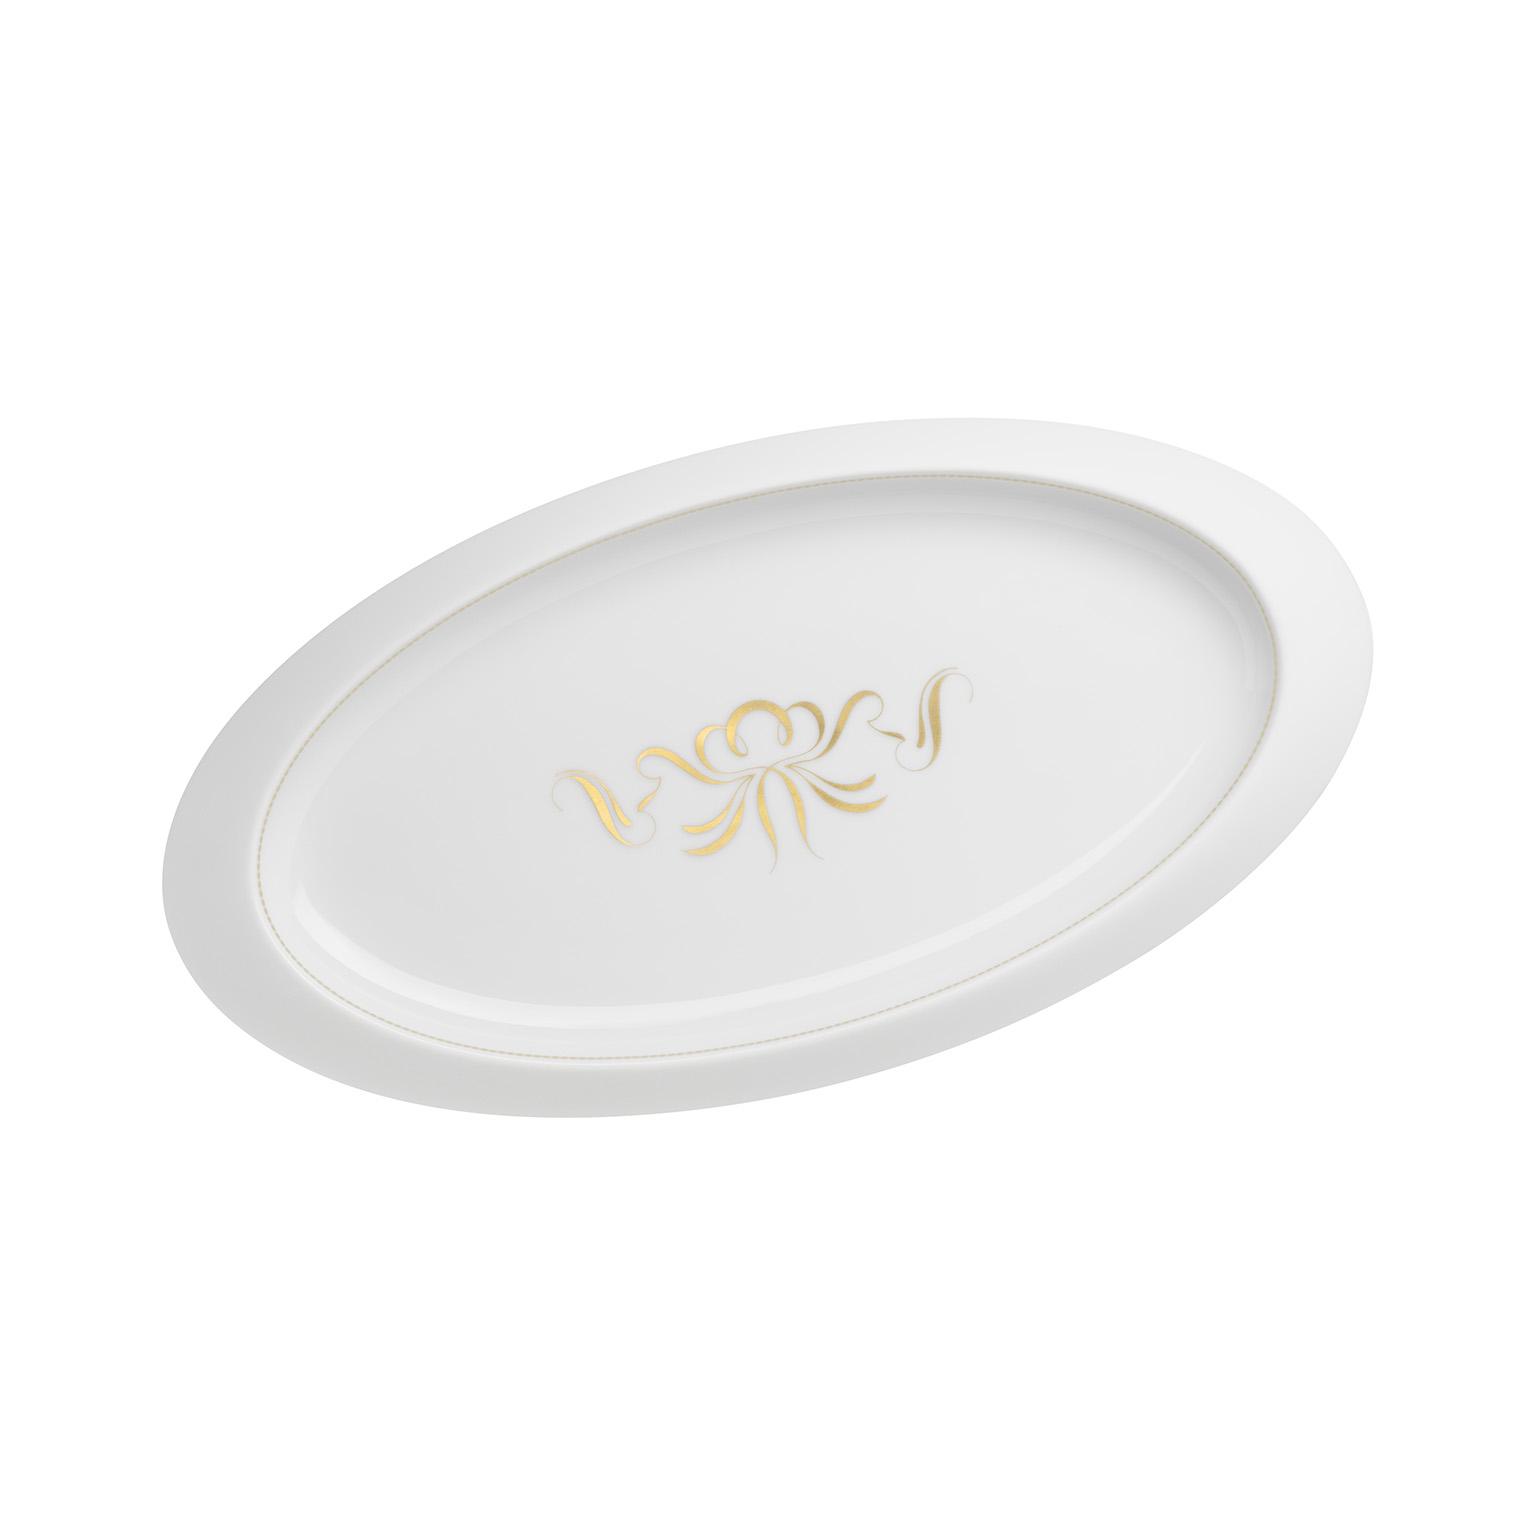 Alif Gold Oval Platter